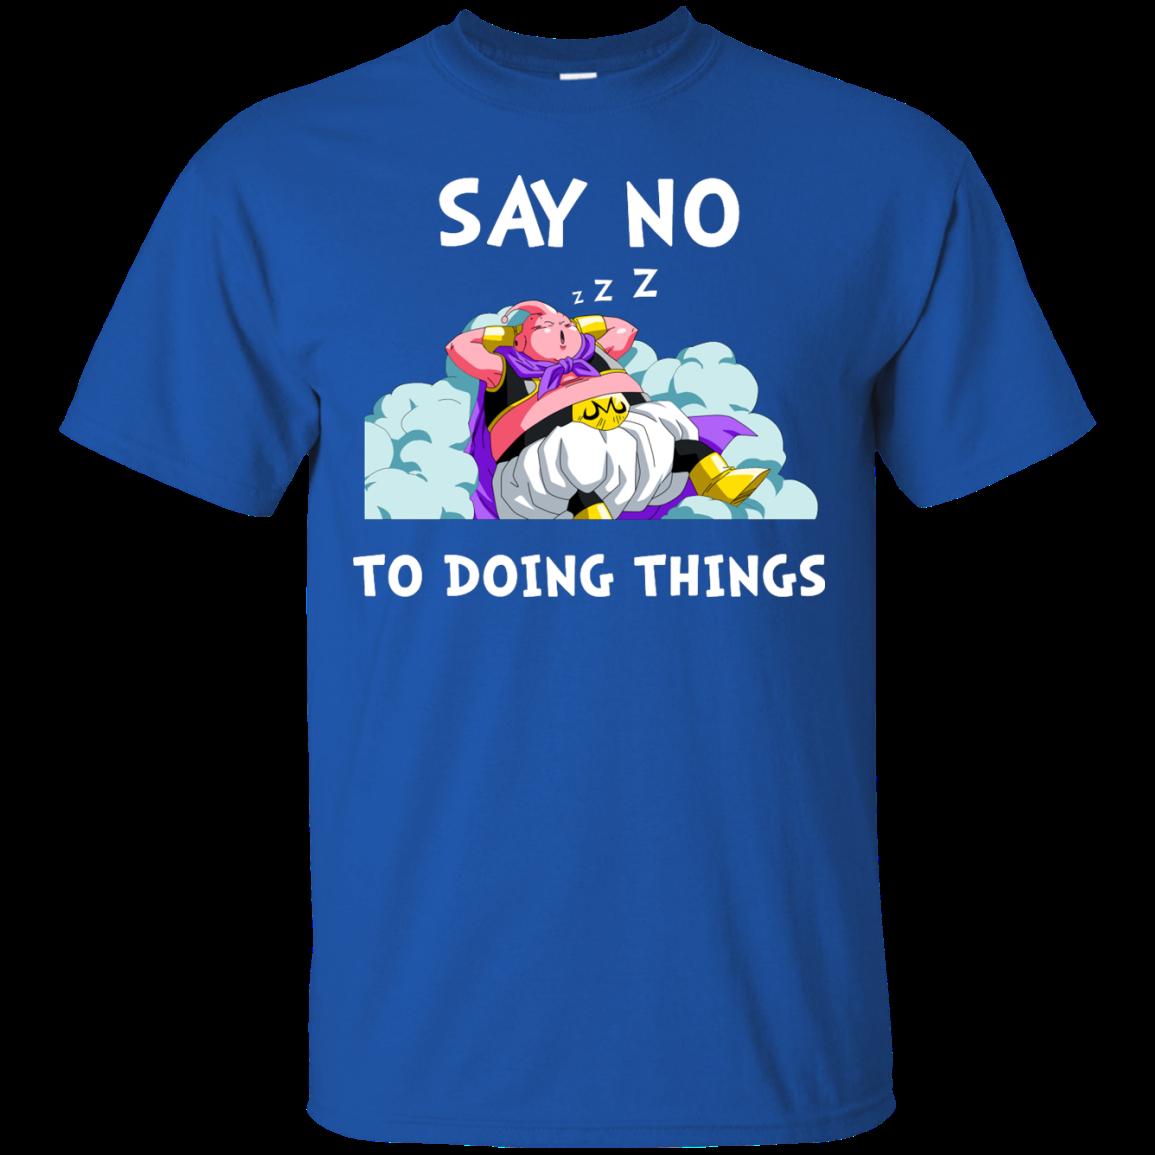 Majin Buu DragonBall Shirts Say no to doing things T shirt,Tank top & Hoodies